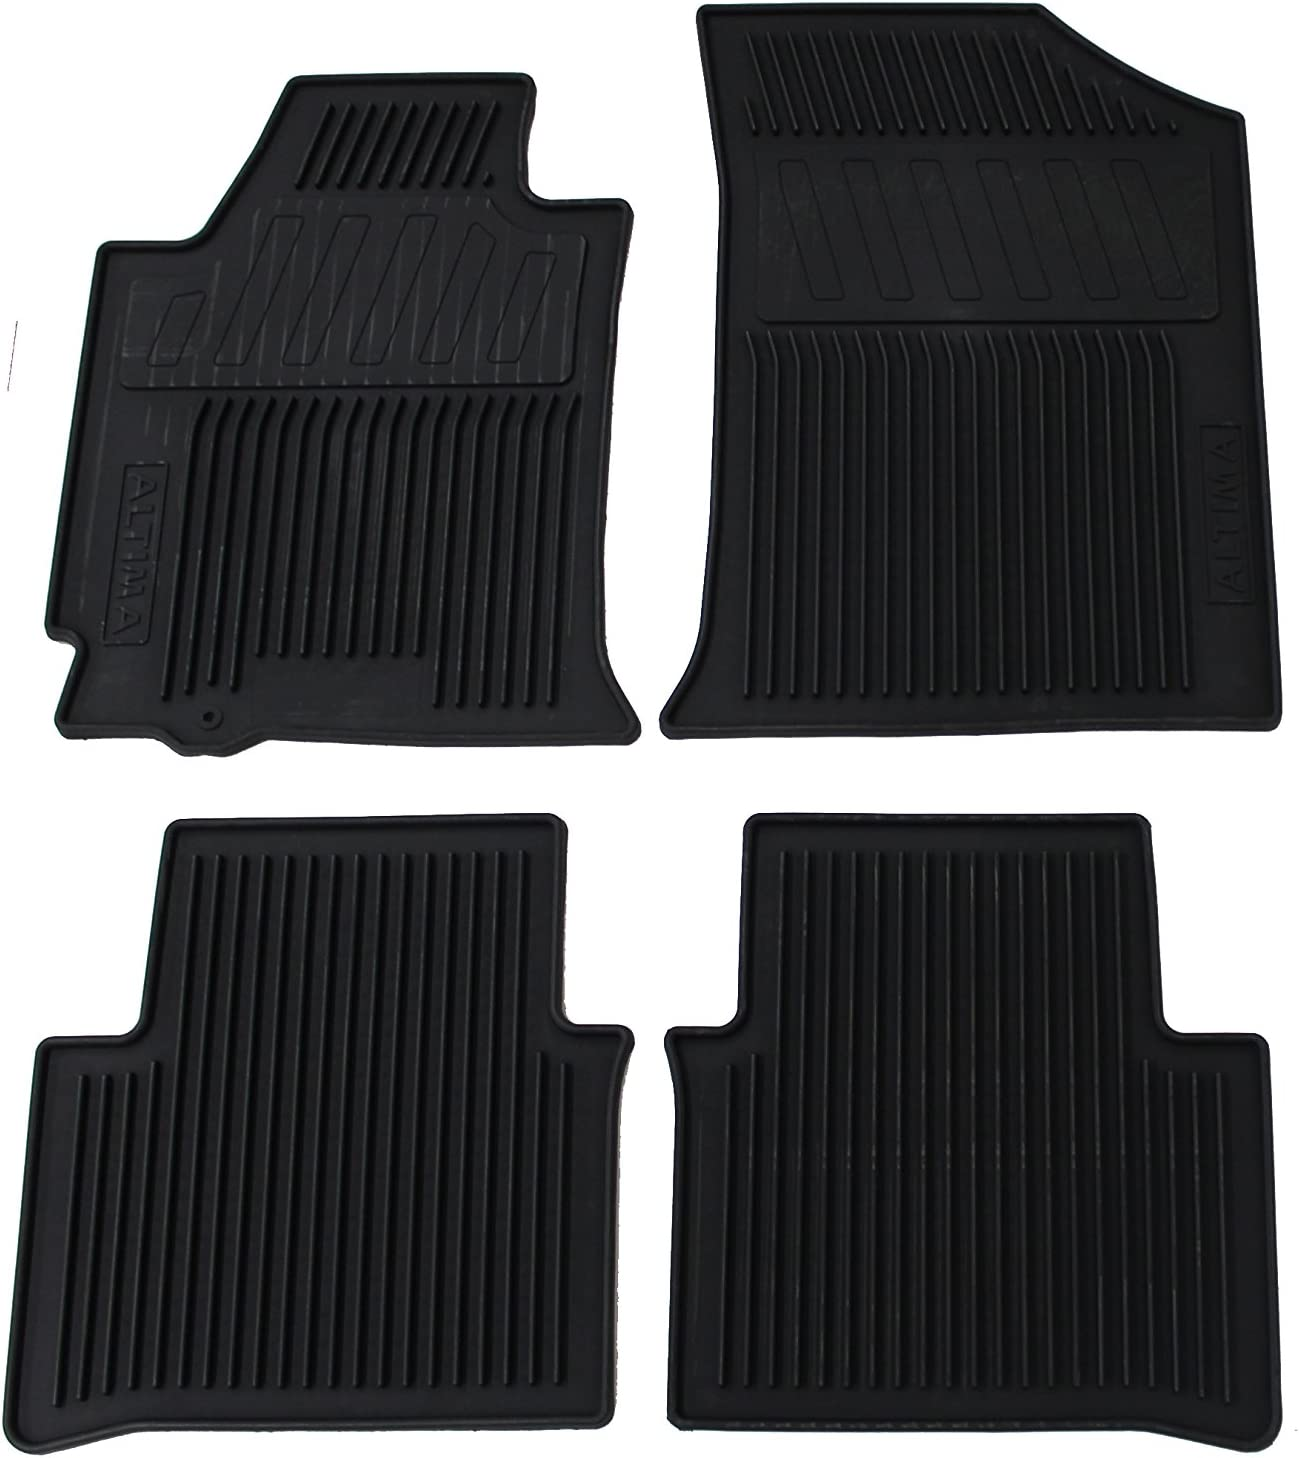 Genuine Nissan Floor Mats Carpet 999E2-UUC00BK